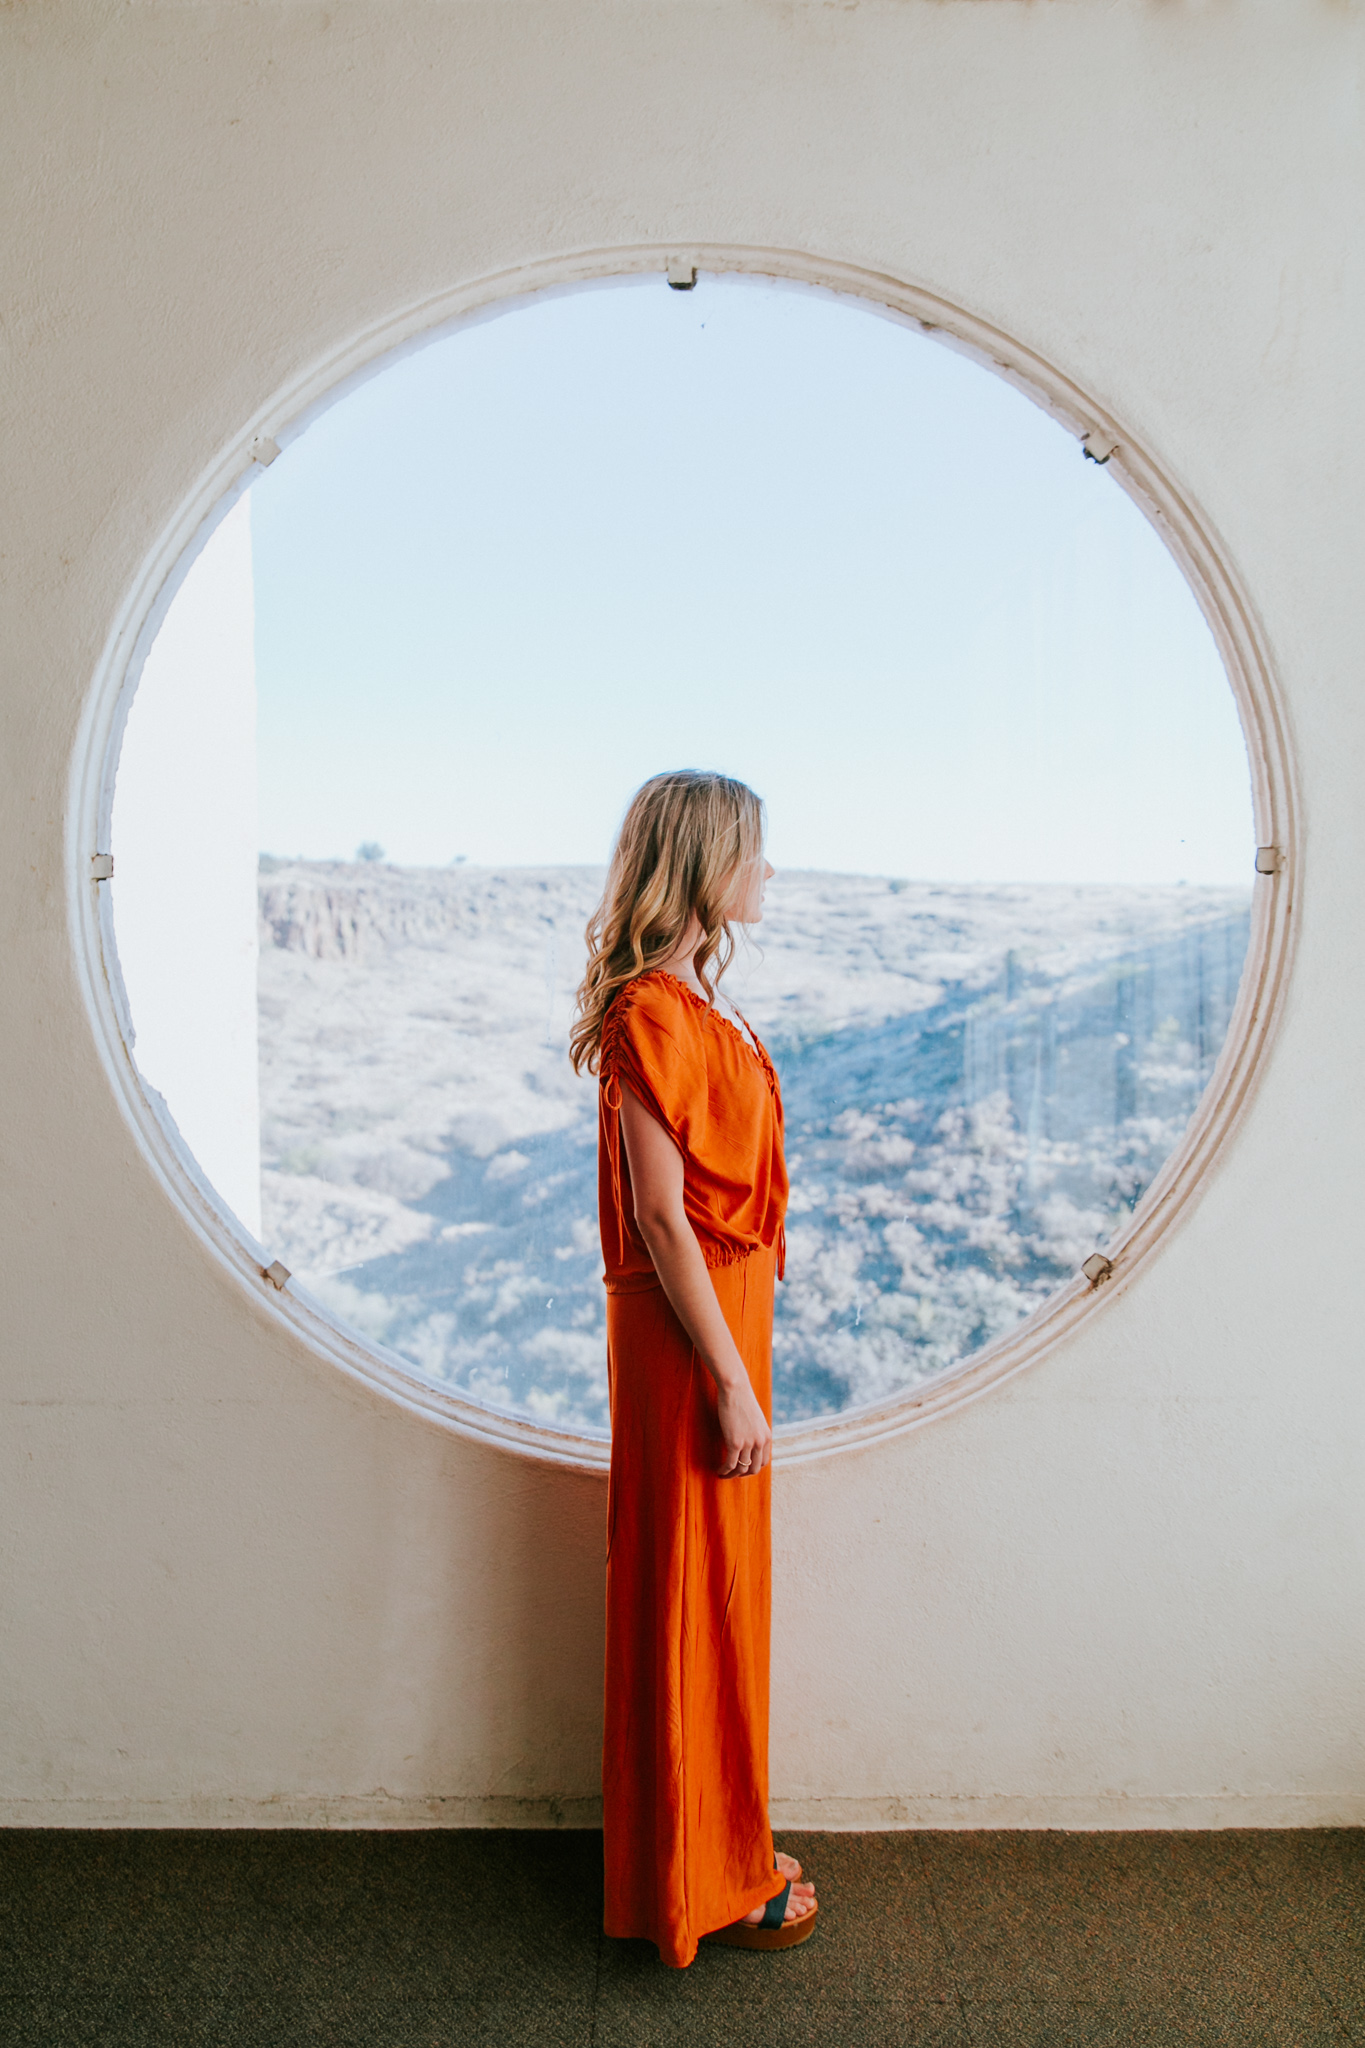 ChelseaScottEvans-Arcosanti-018.jpg